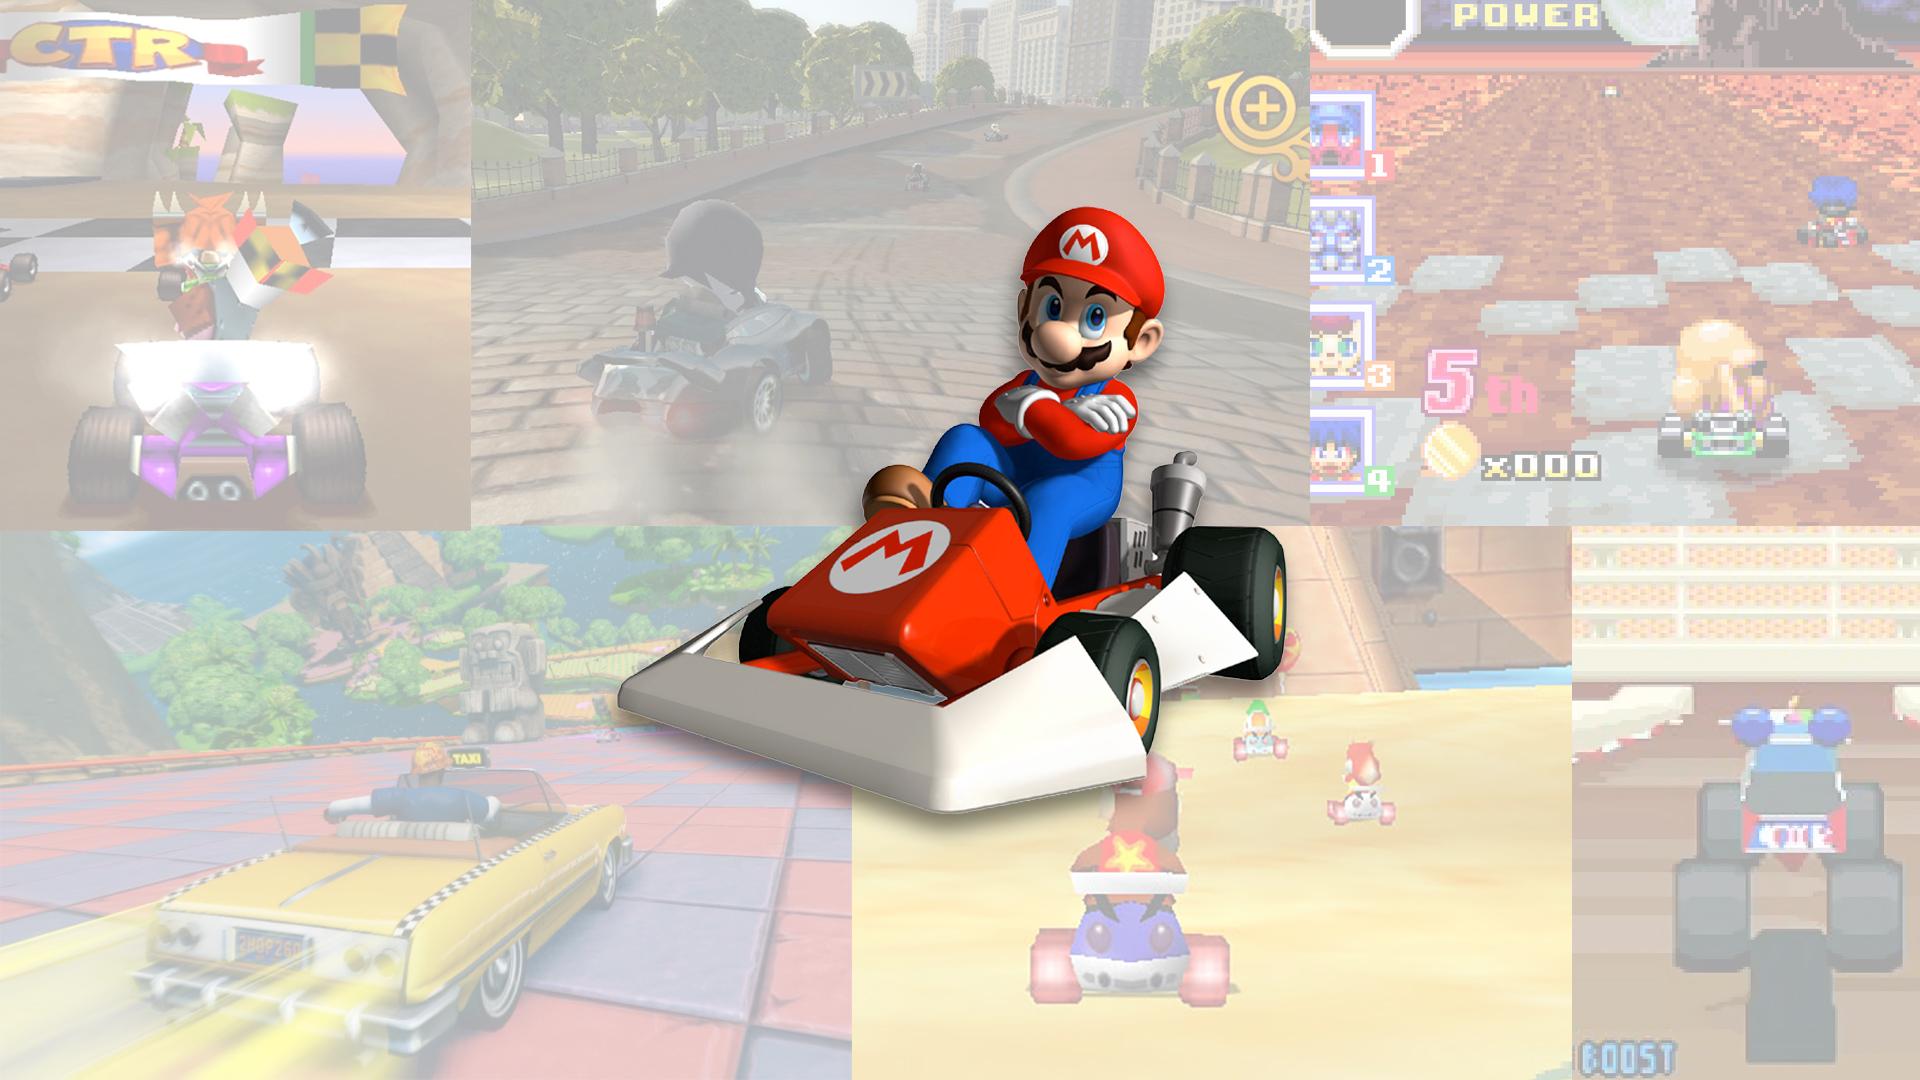 The best Mario Kart games (that aren't Mario Kart) | TechRadar